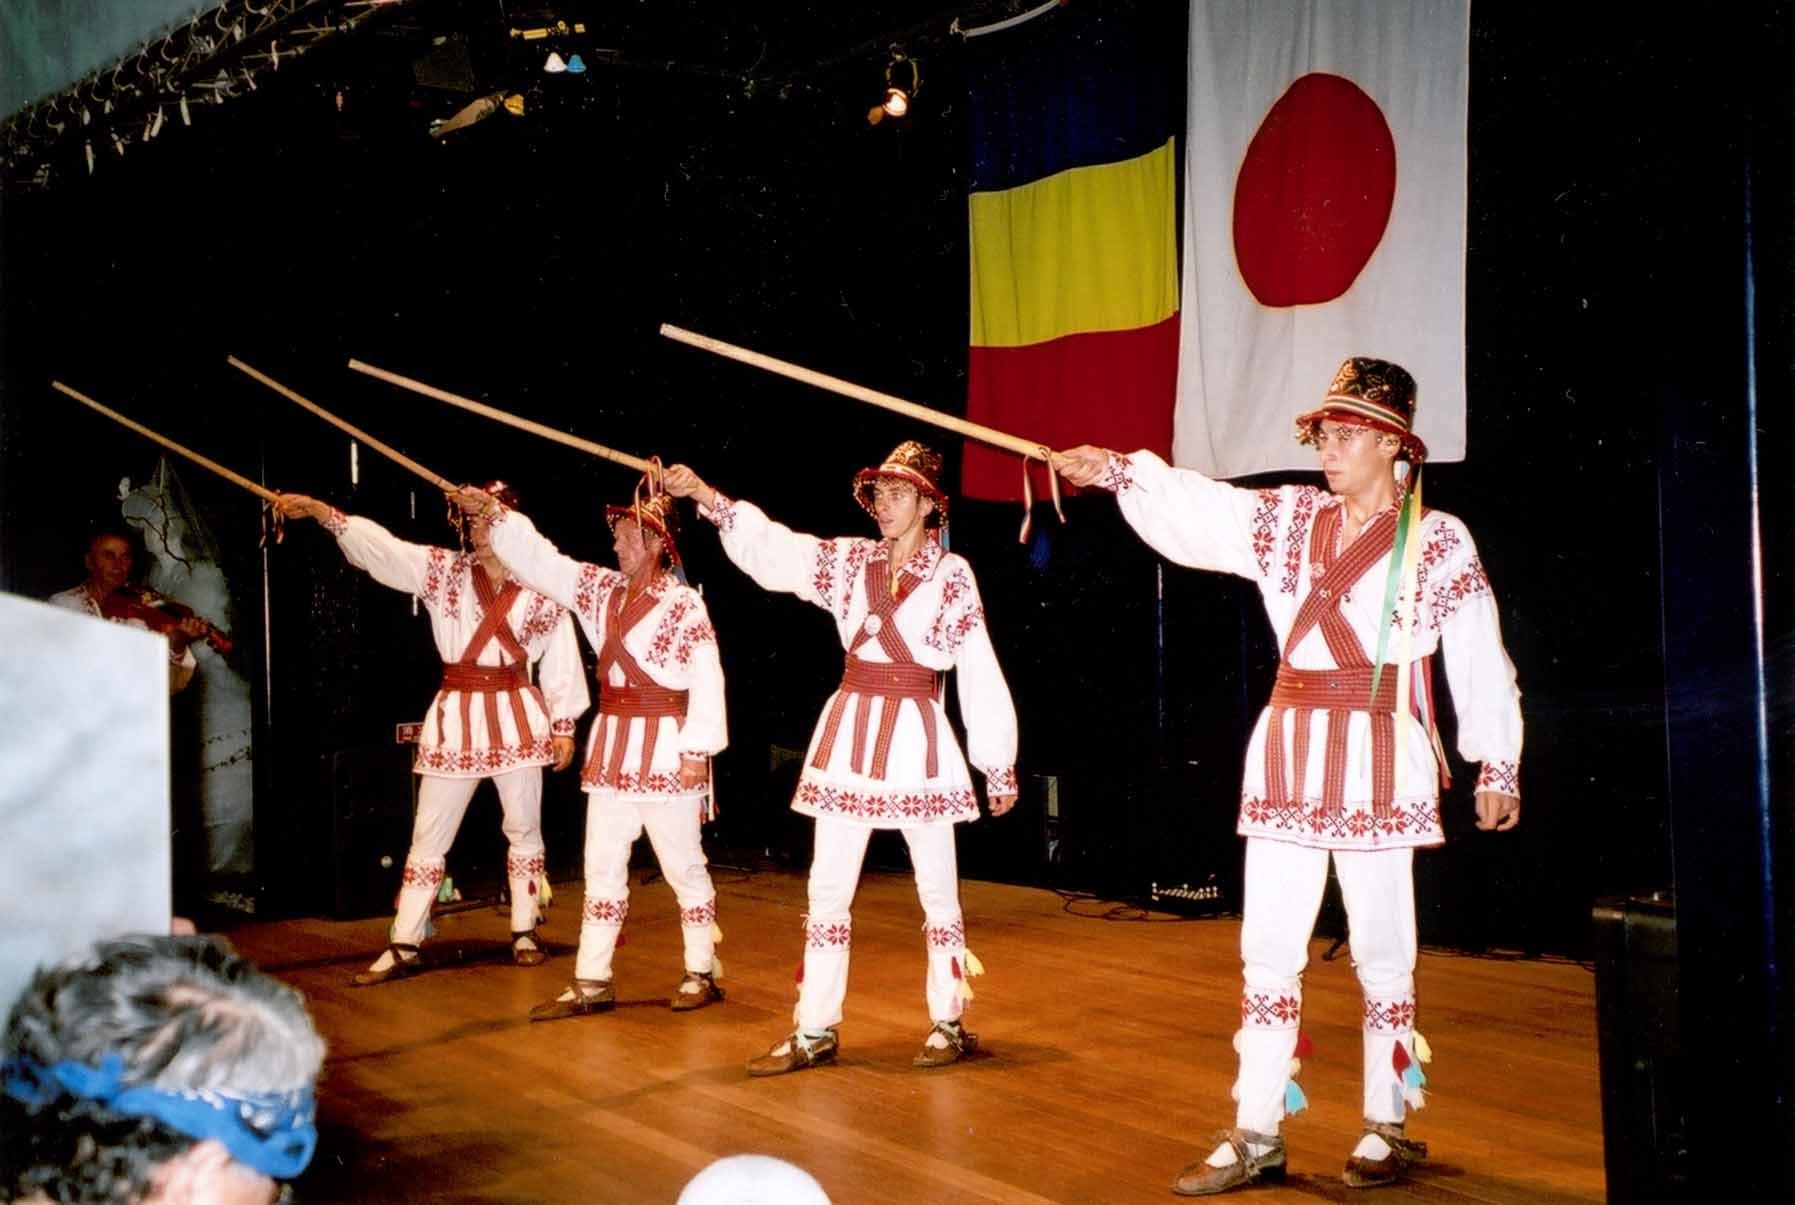 26-calus-Calusari-din-Cezieni-la-Expozitia-Universala-Aichi-Japonia-2005